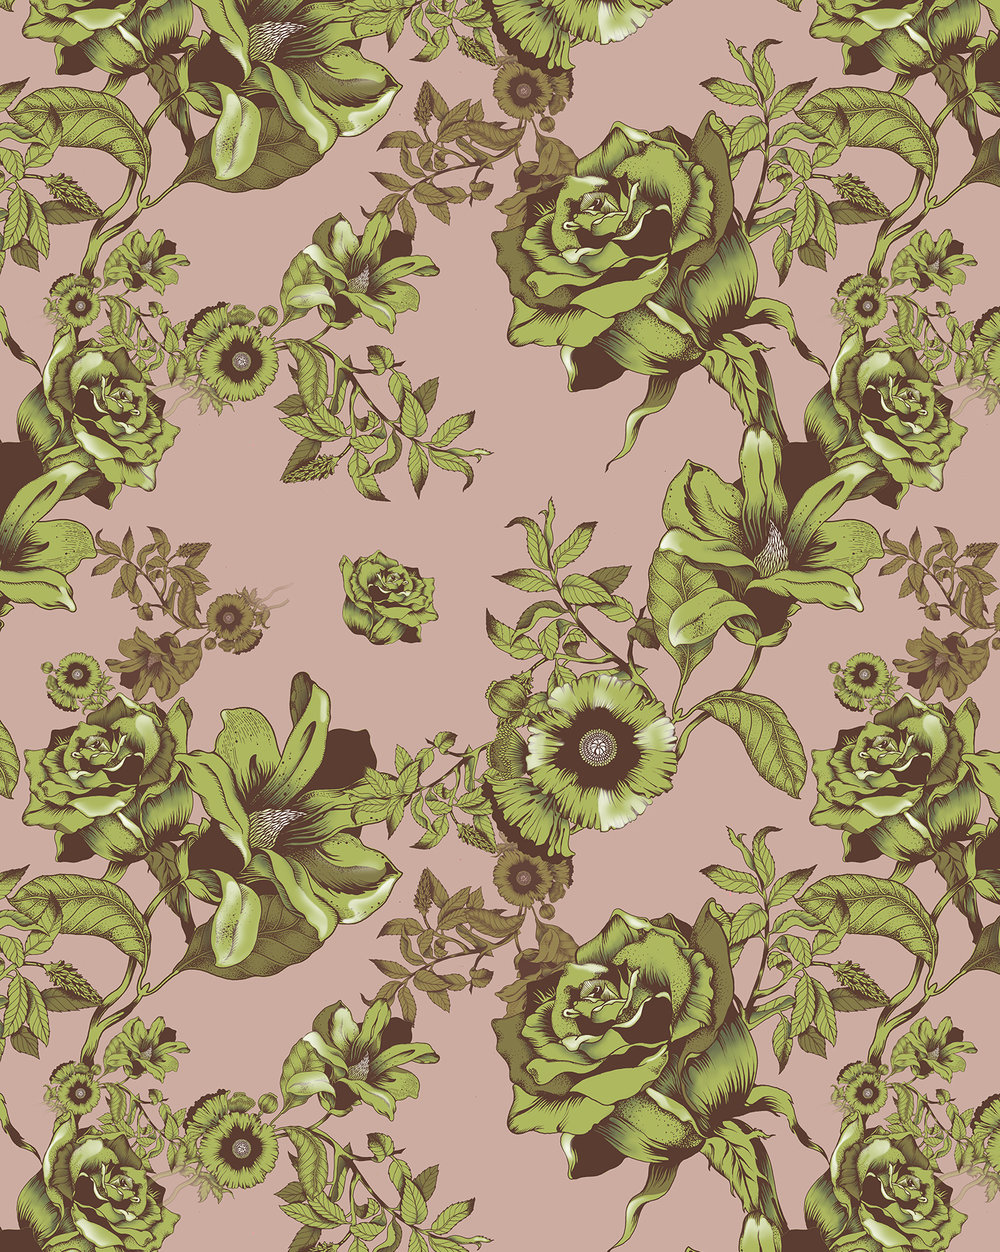 PommeChan_PatternFinal1_Green_Pink_1 copy.jpg